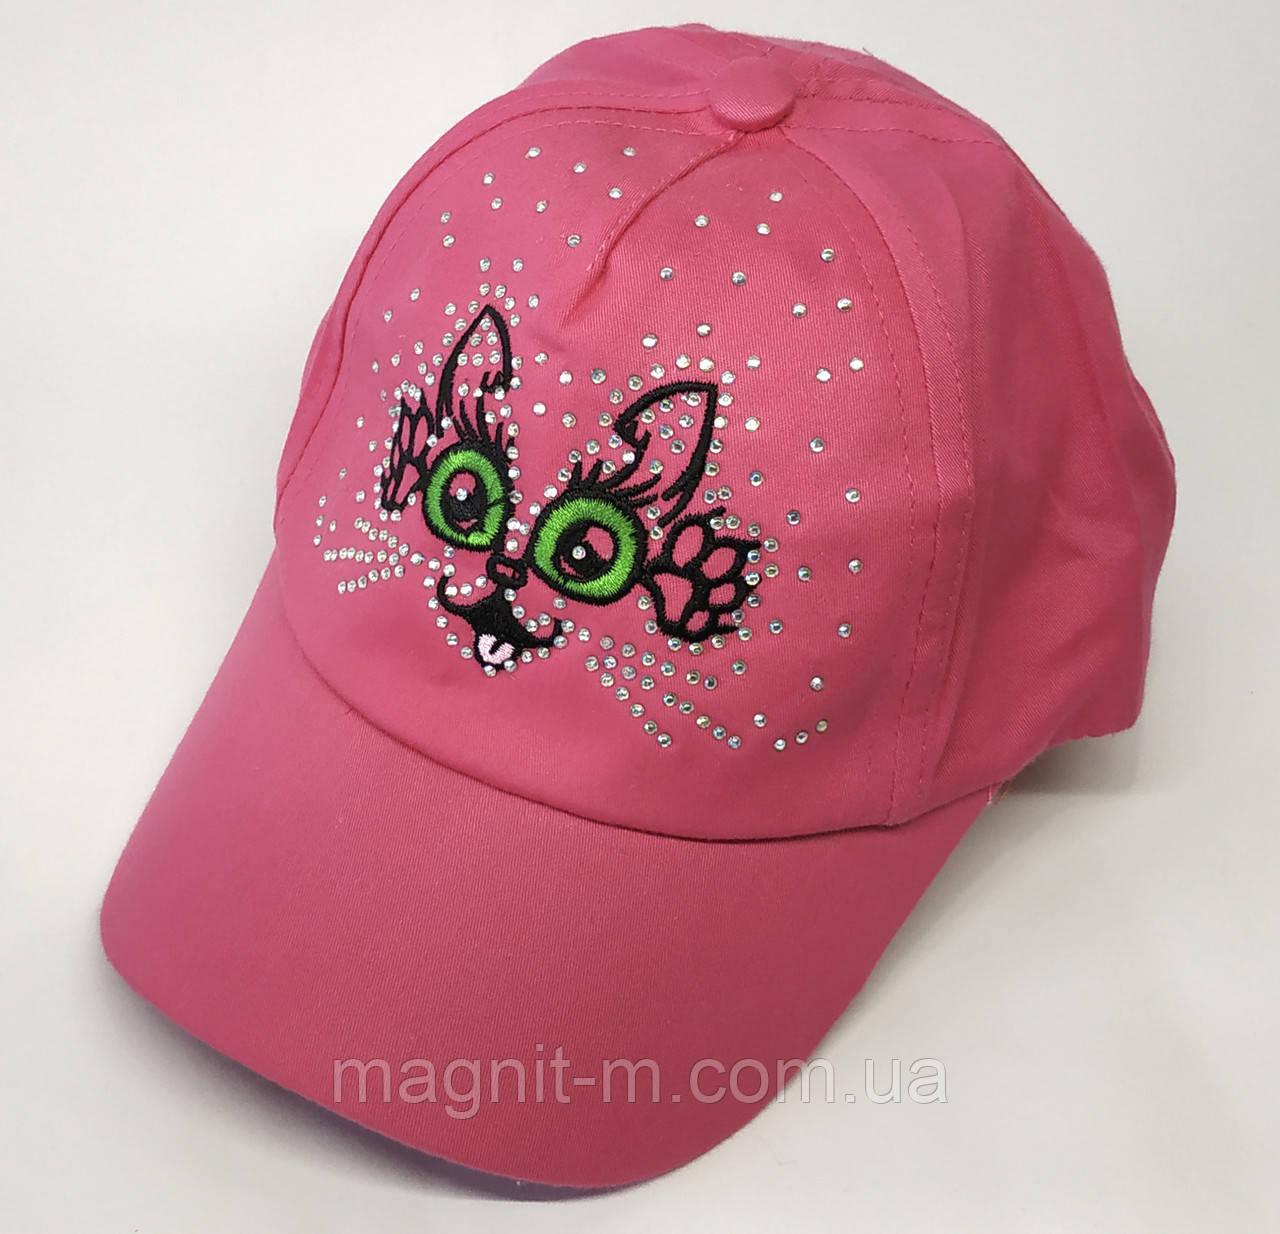 "Кепка для девочки ""Кошечка со стразами"". 3-4 года. Розового цвета."